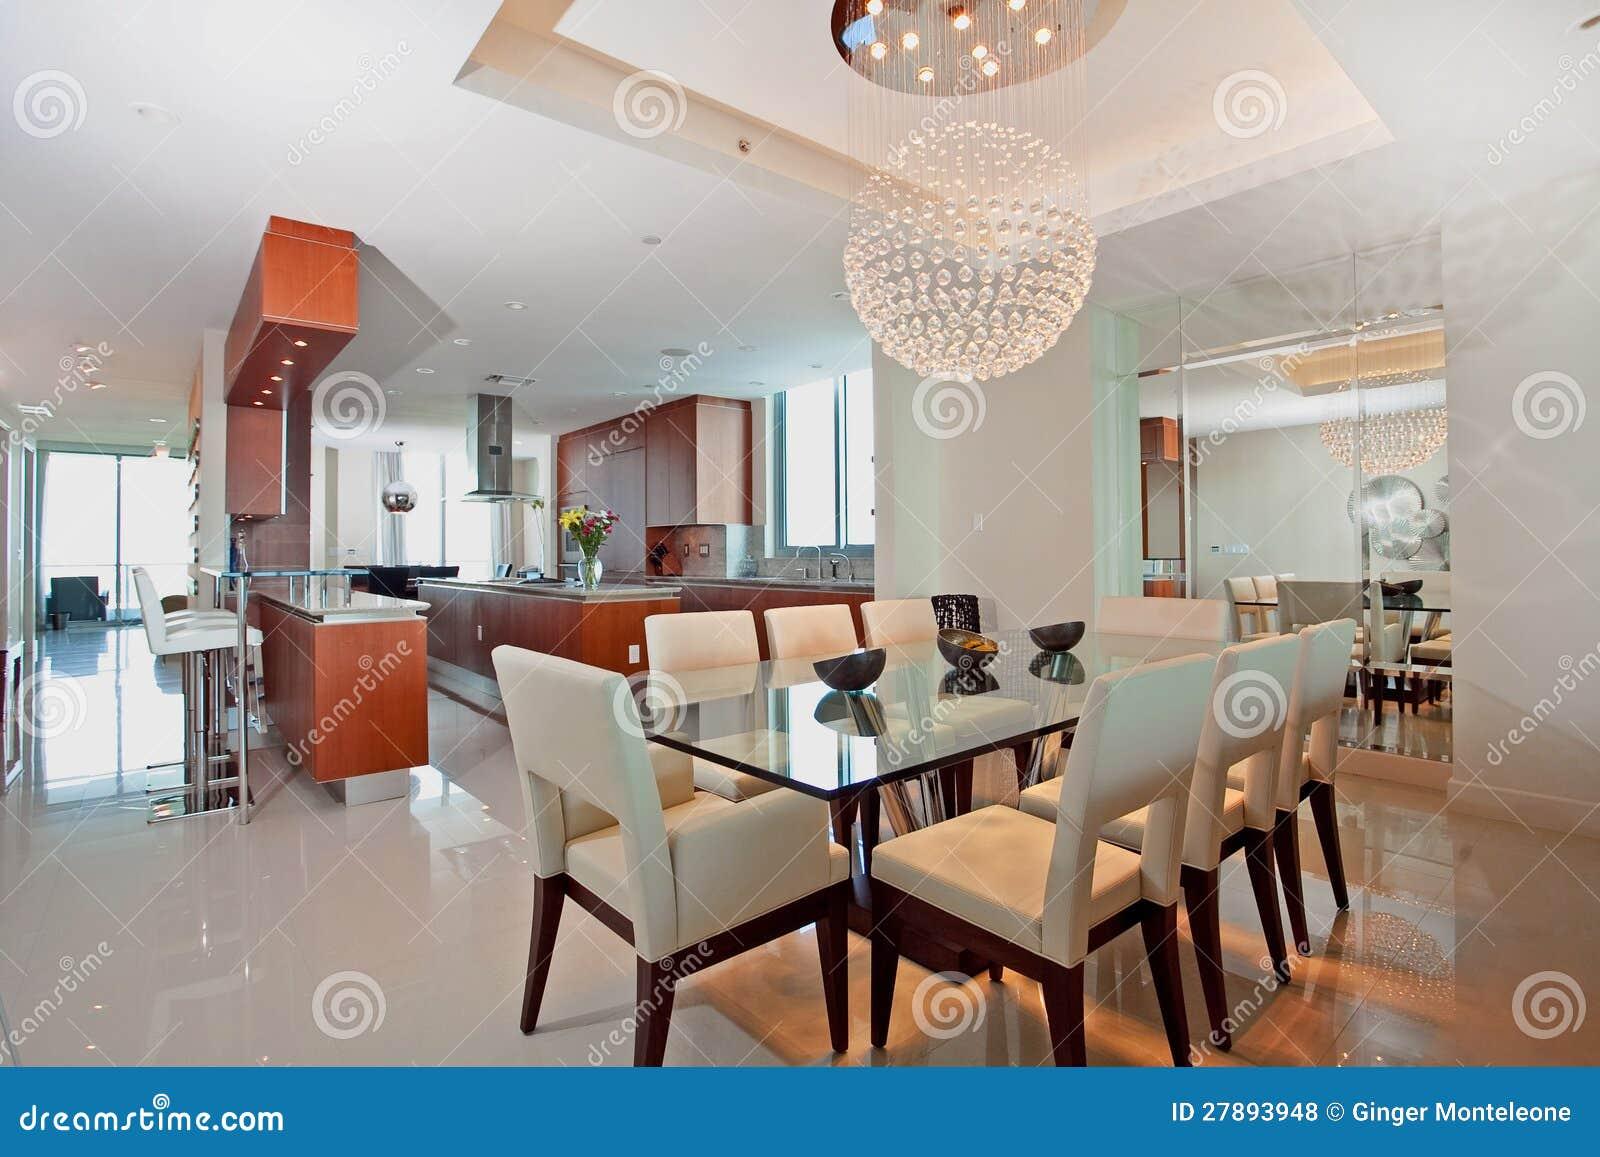 Cozinha E Sala De Jantar Abertas Modernas Fotos de Stock Royalty Free  #965535 1300 957